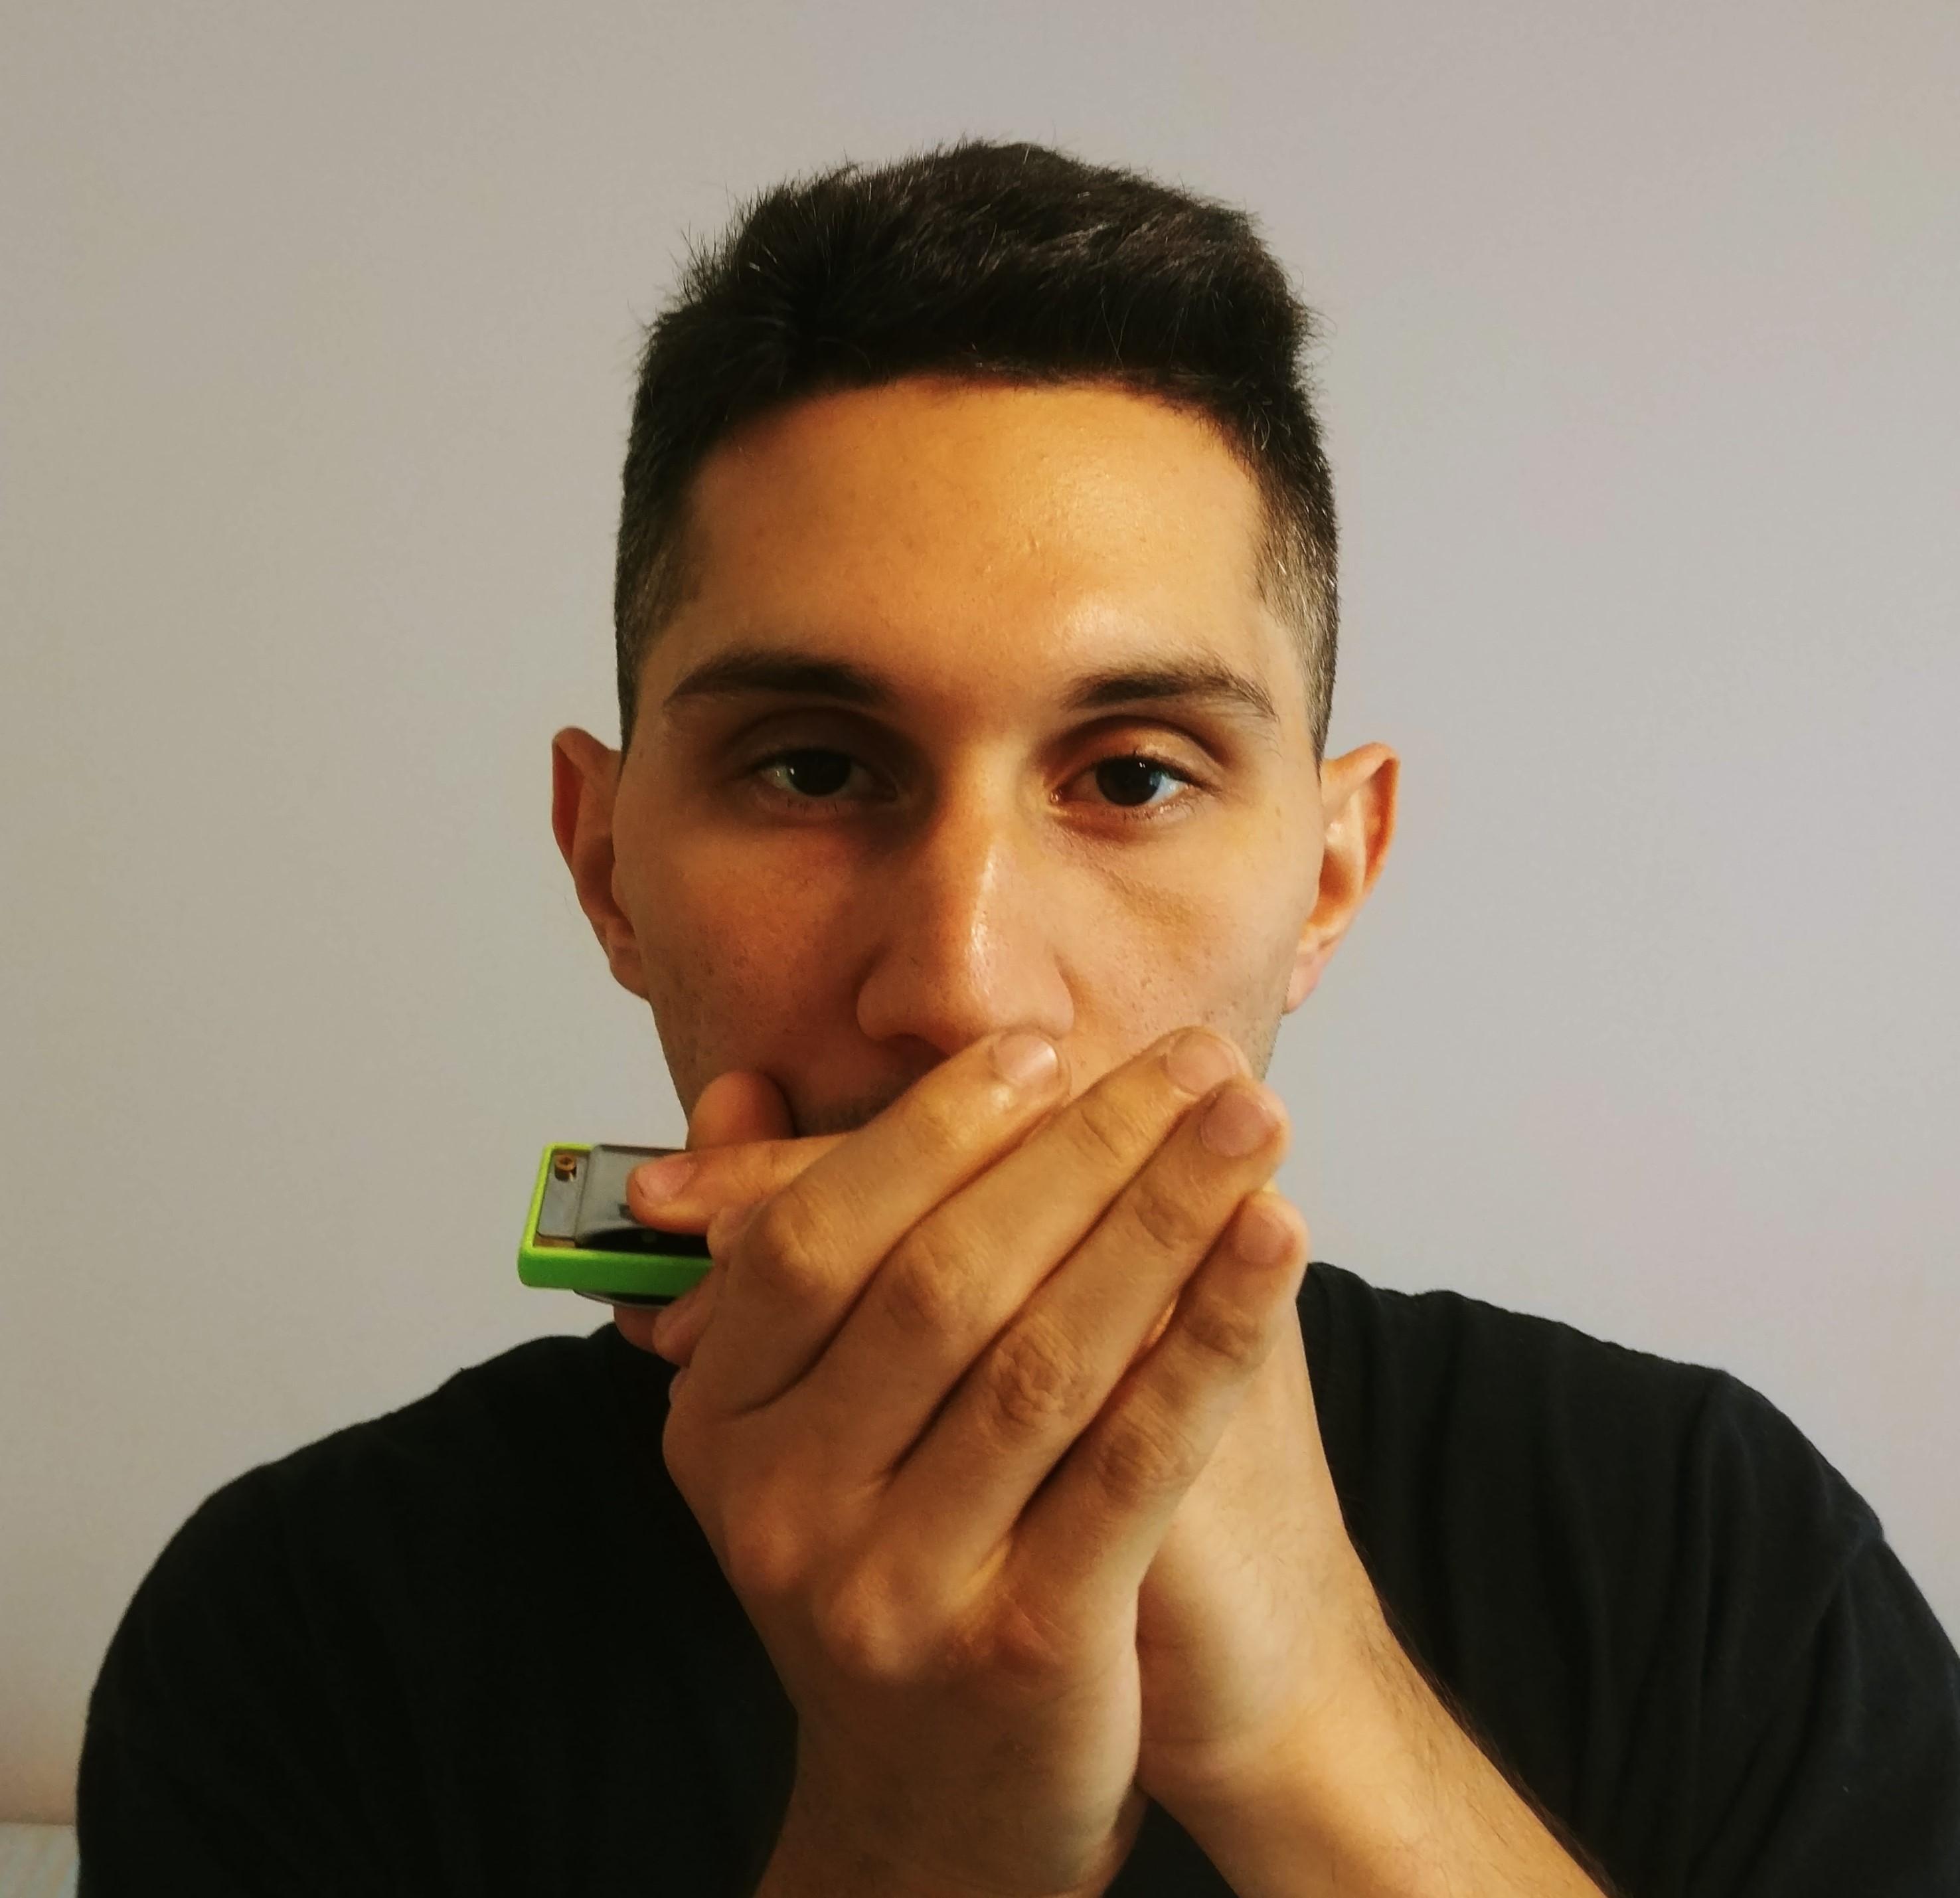 A boy holding the harmonica.